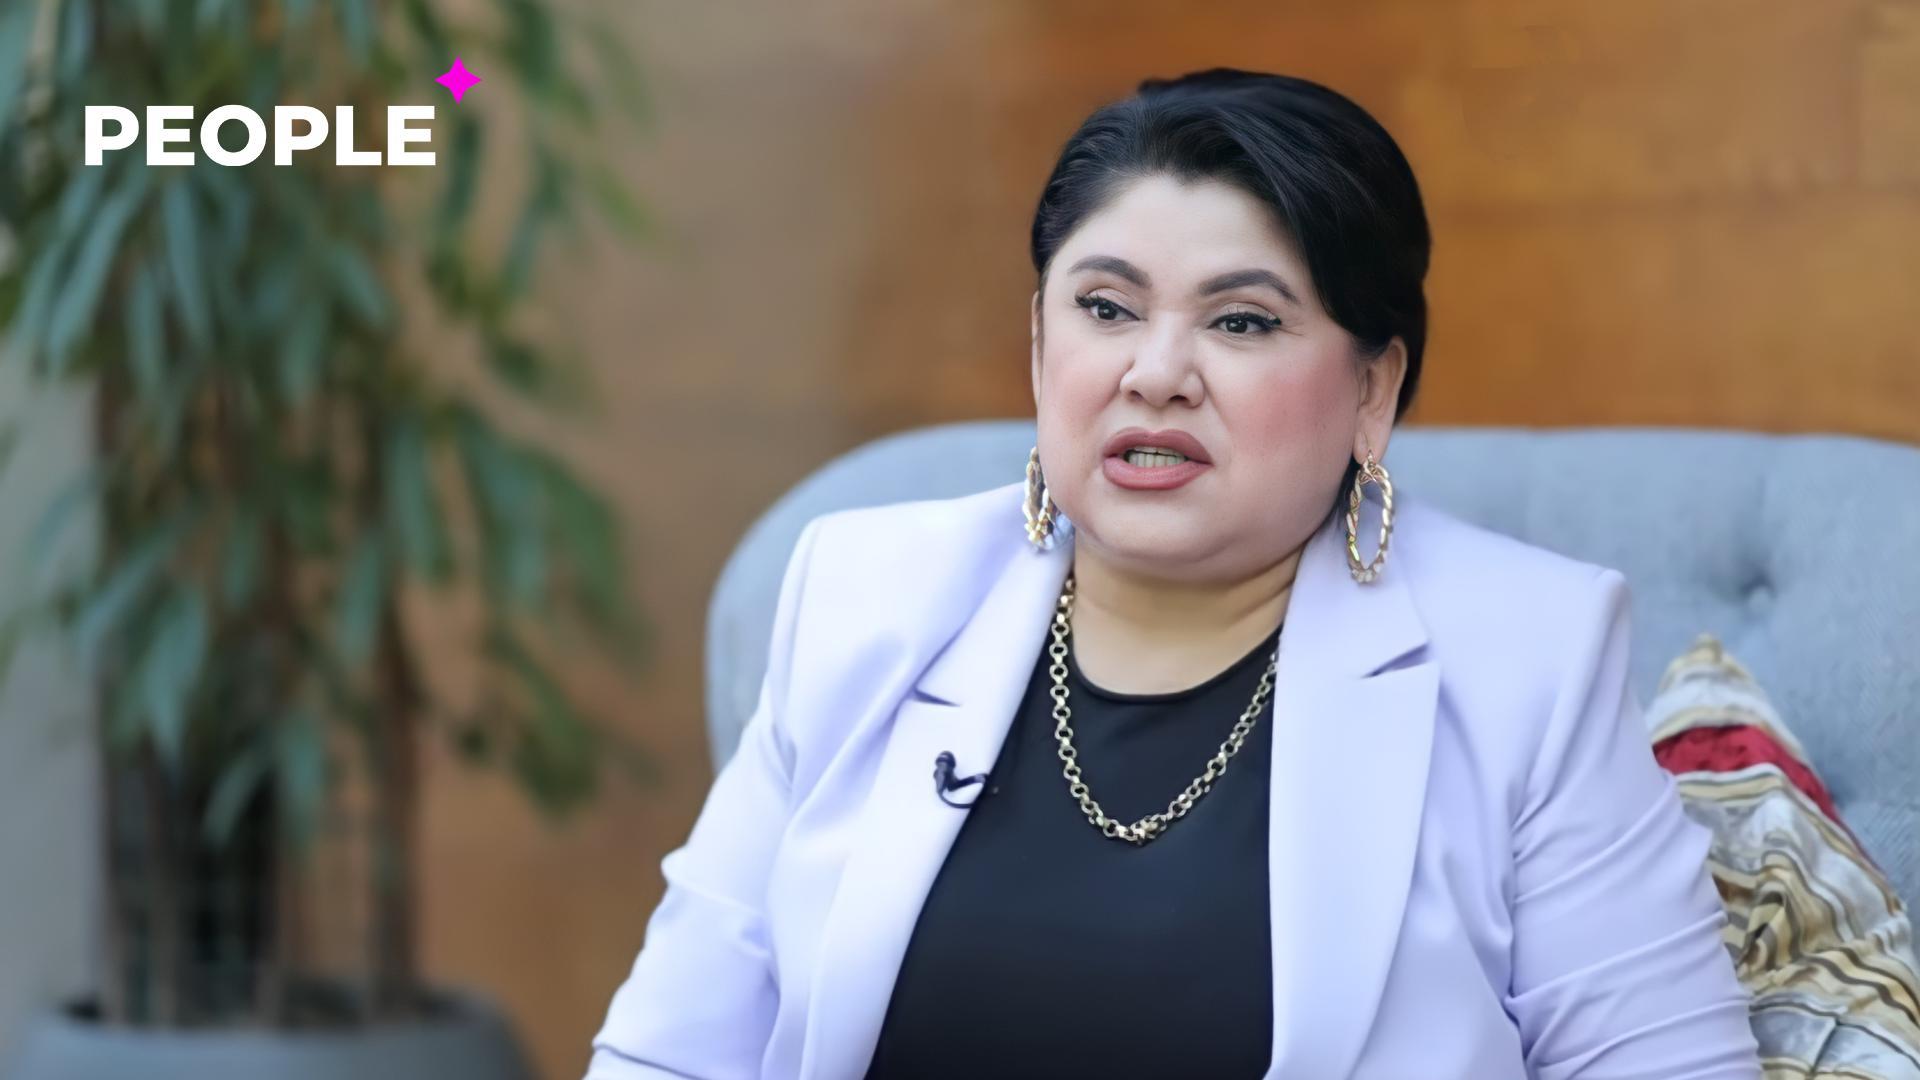 Певица Дильфуза Исмаилова ответила на обвинения в пластических операциях – видео